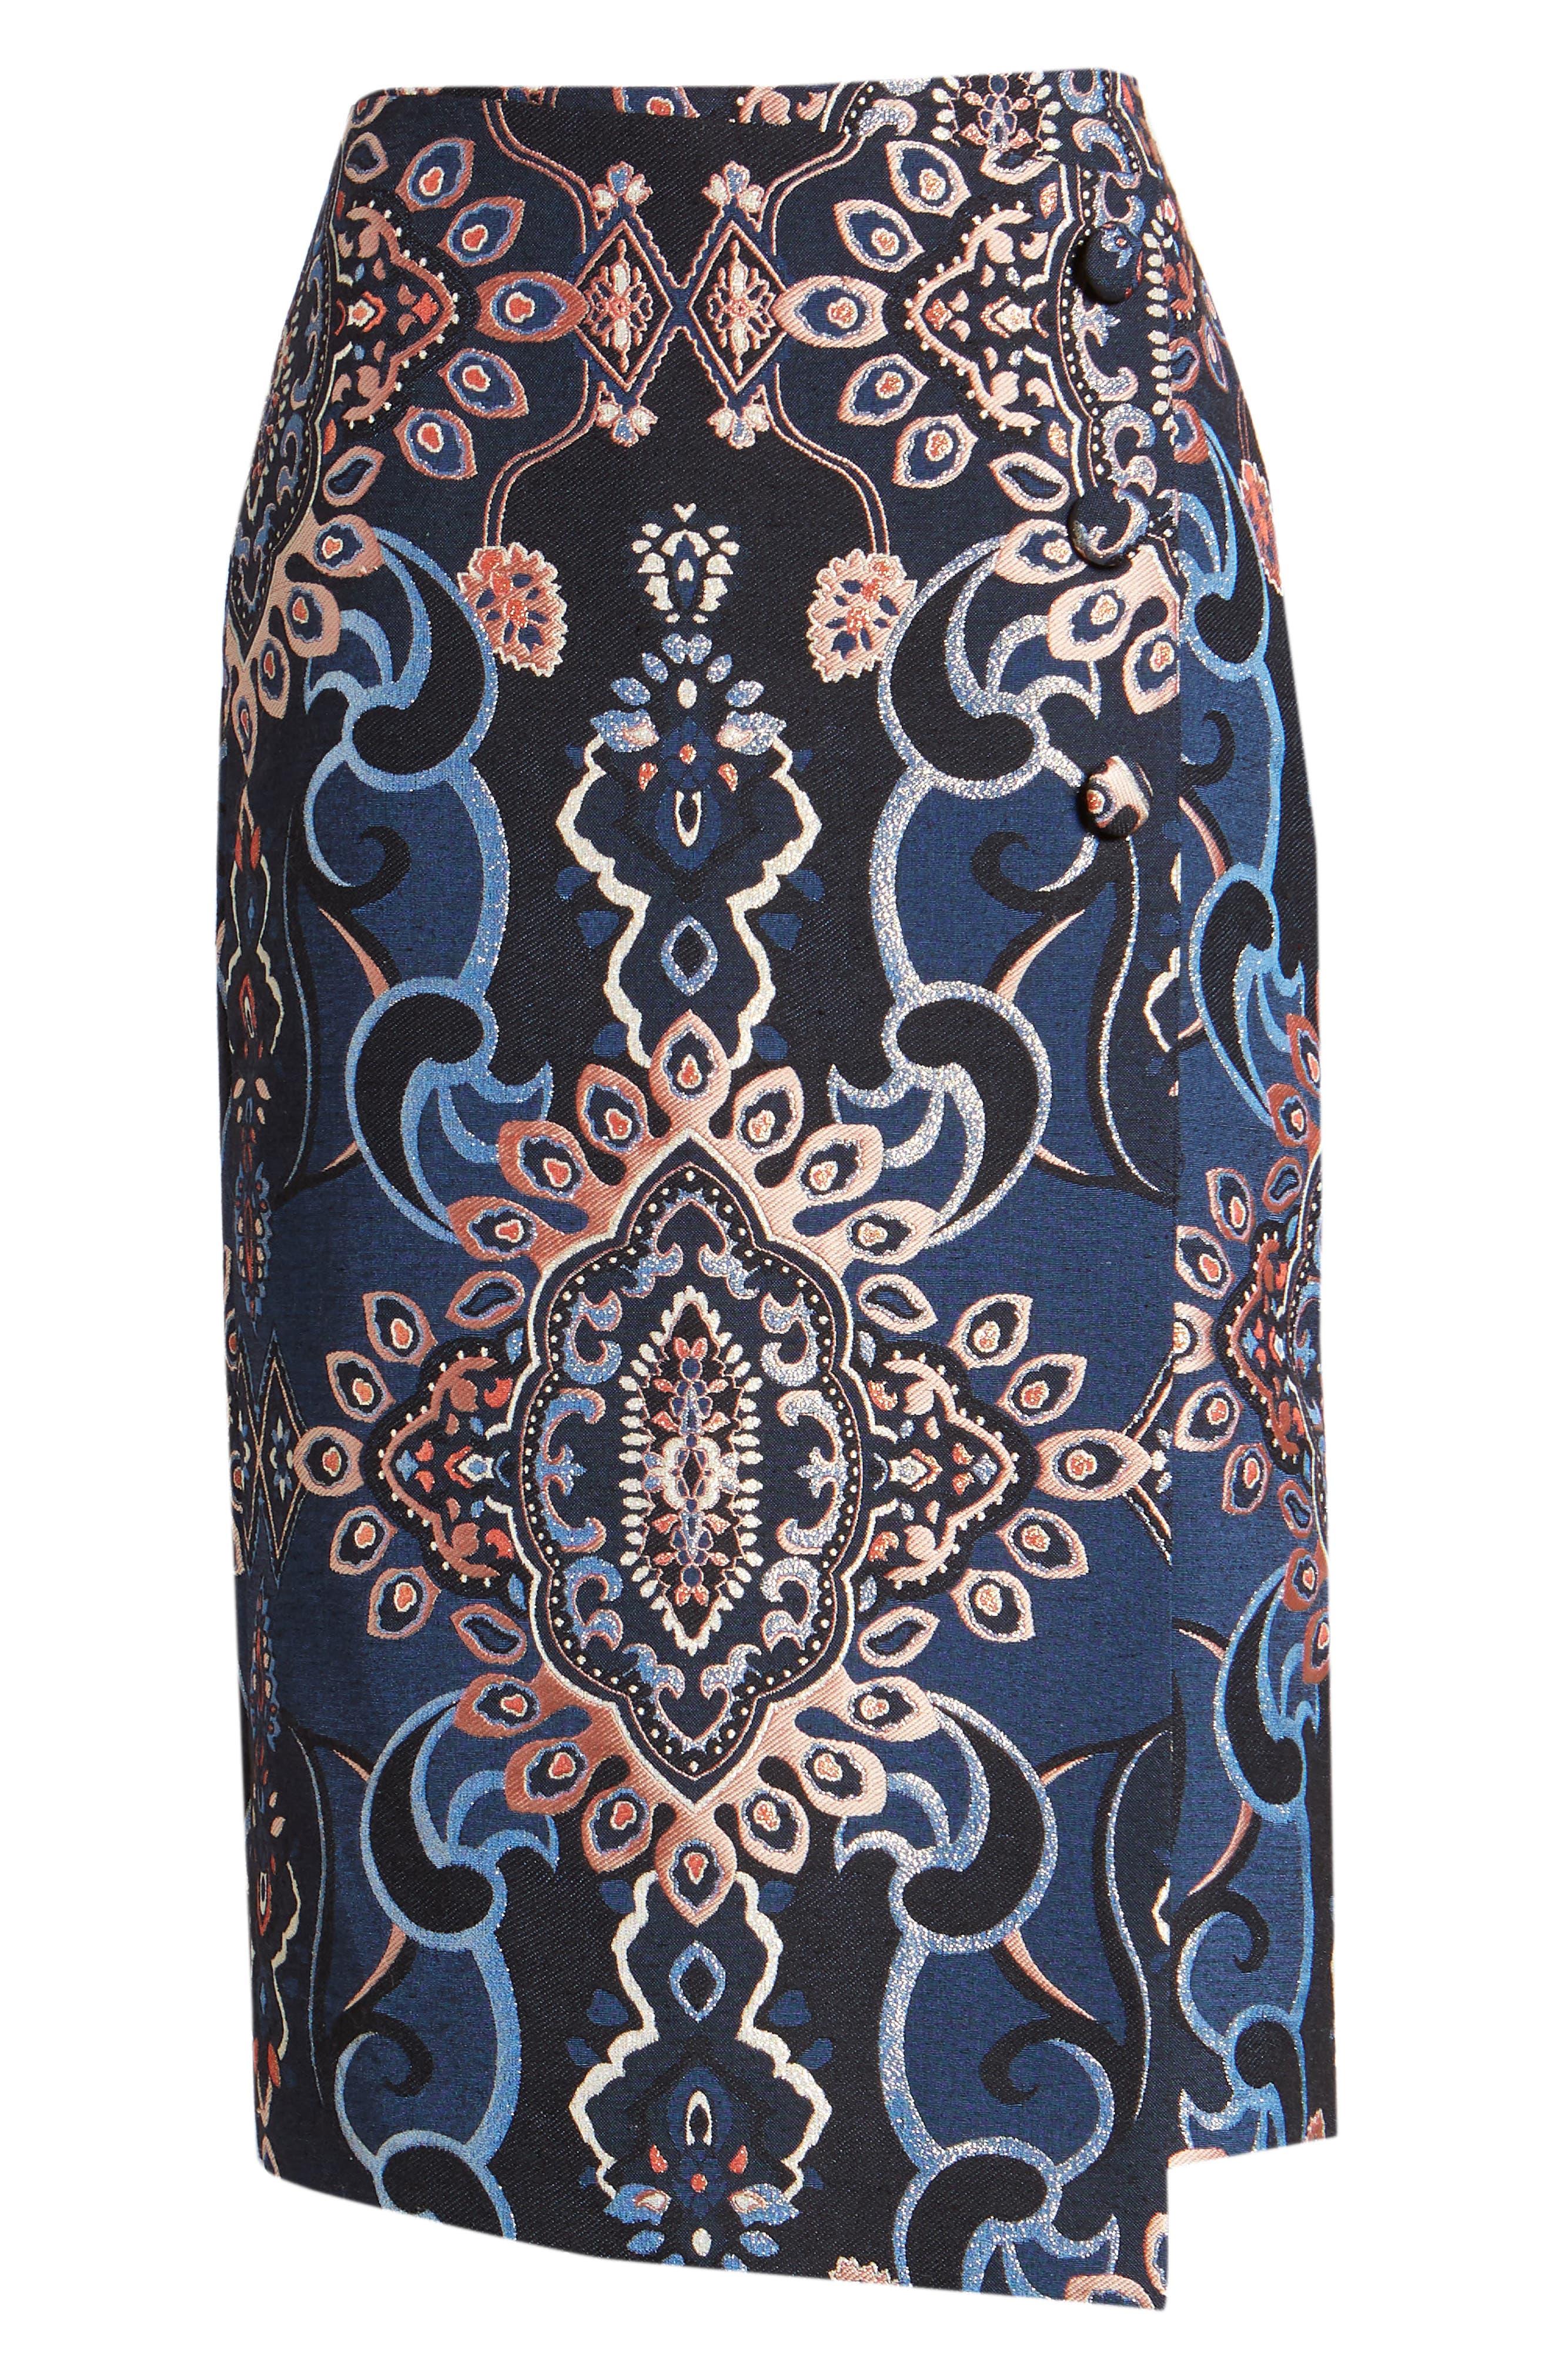 Button Detail Skirt,                             Alternate thumbnail 6, color,                             NAVY MULTI BROCADE